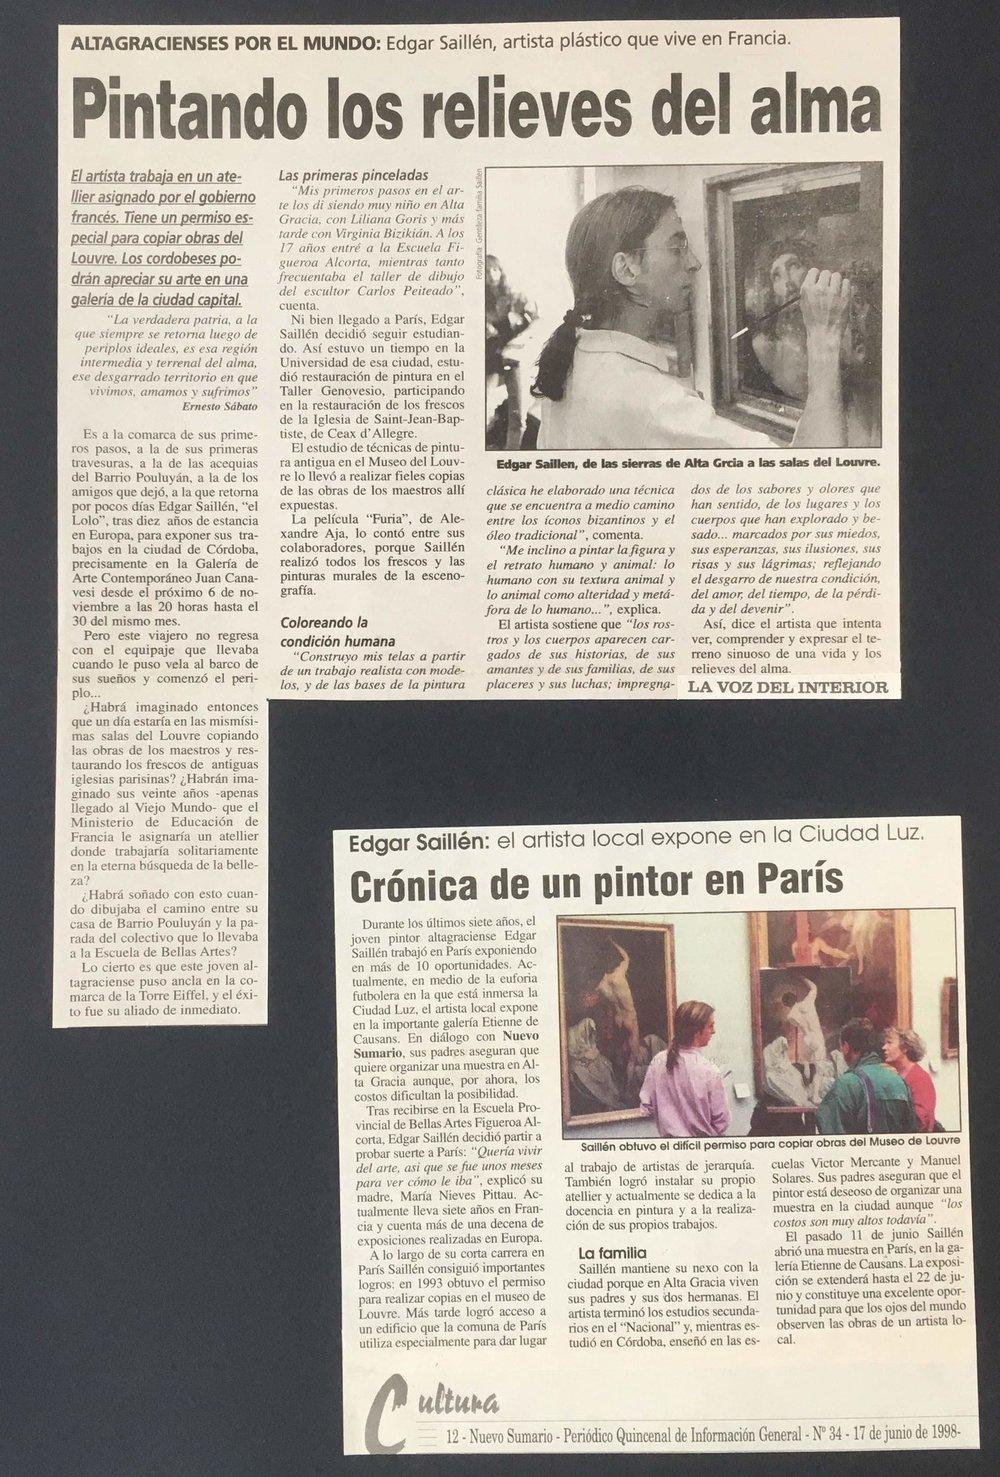 LA VOZ DEL INTERIOR 1998